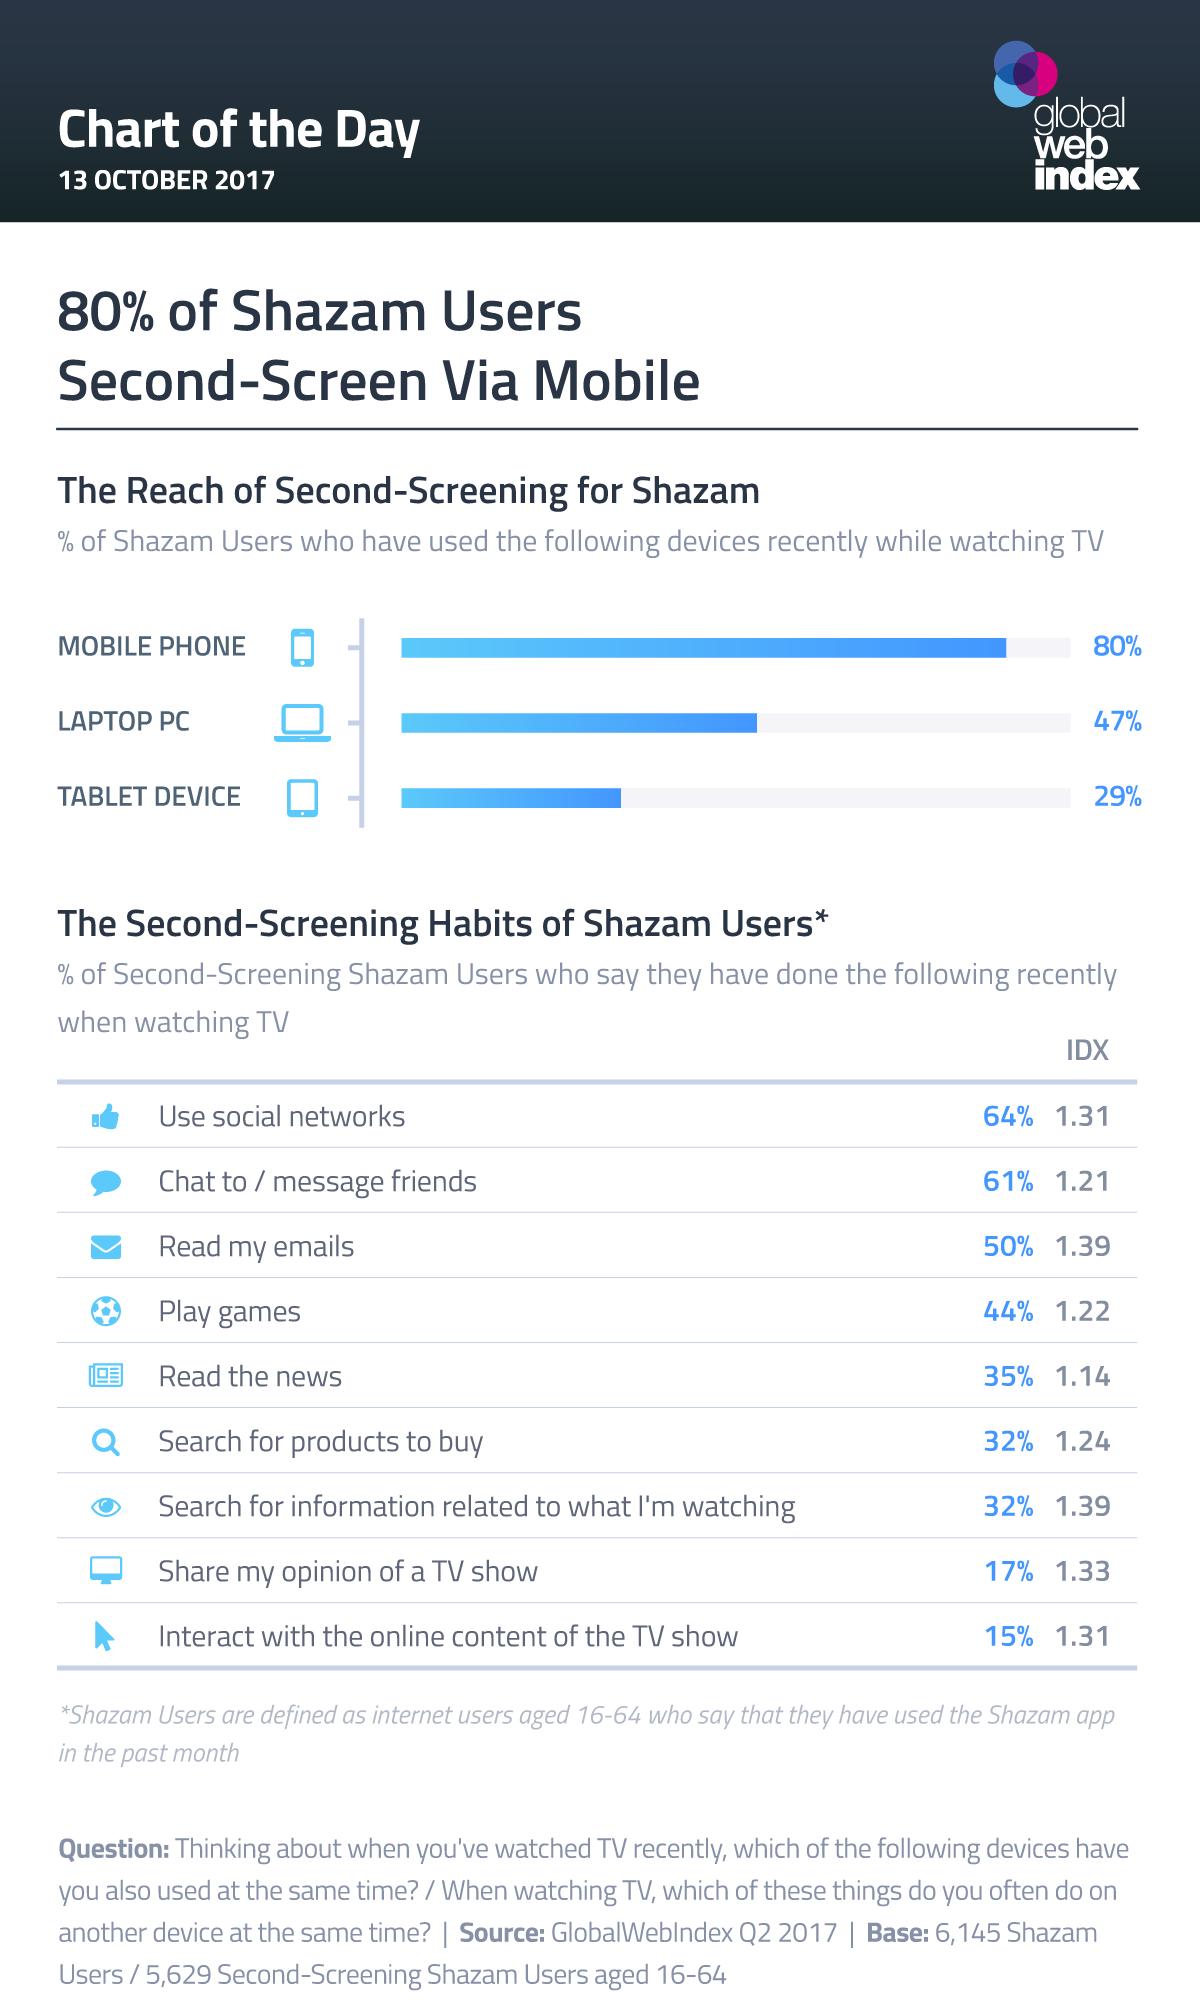 80% of Shazam Users Second-Screen Via Mobile